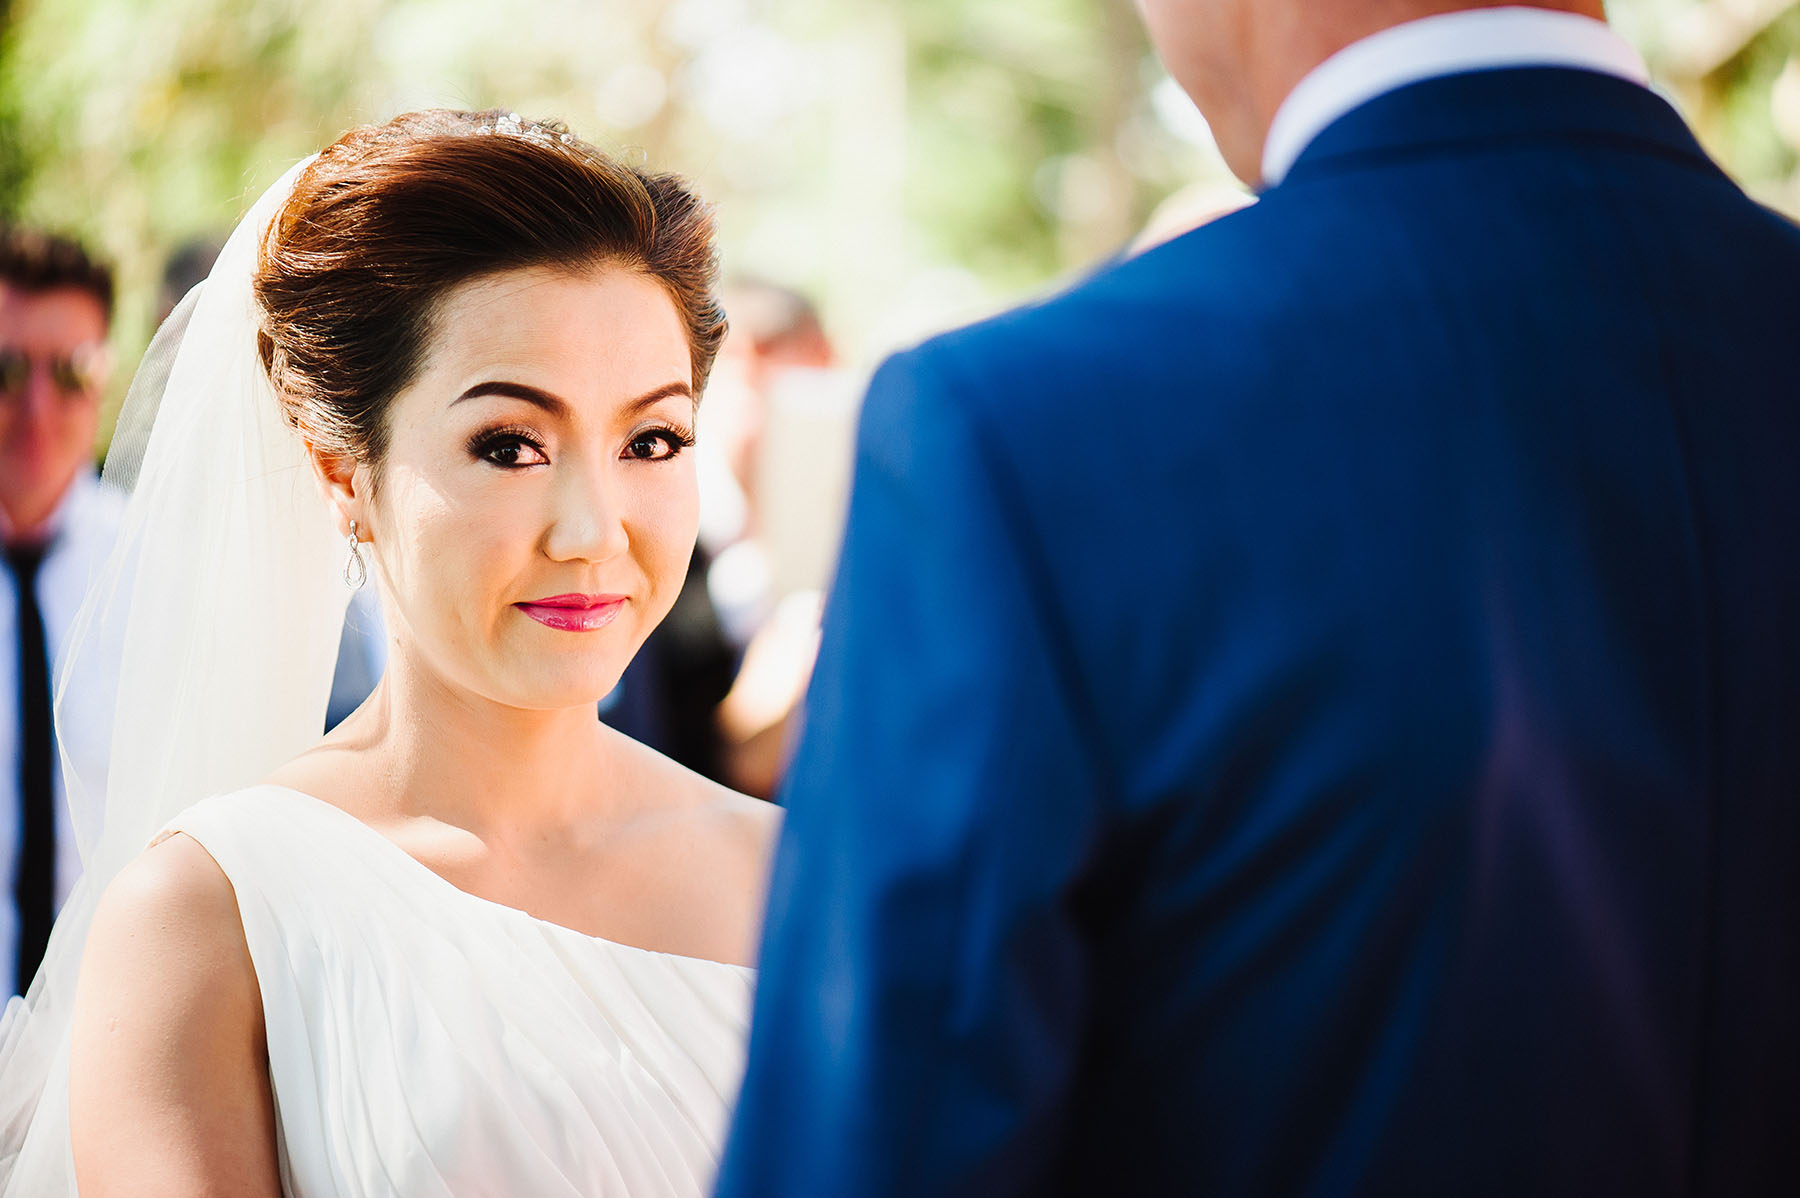 Marryme_wedding_photography_dorrigo_bellingen_photographer_32.jpg